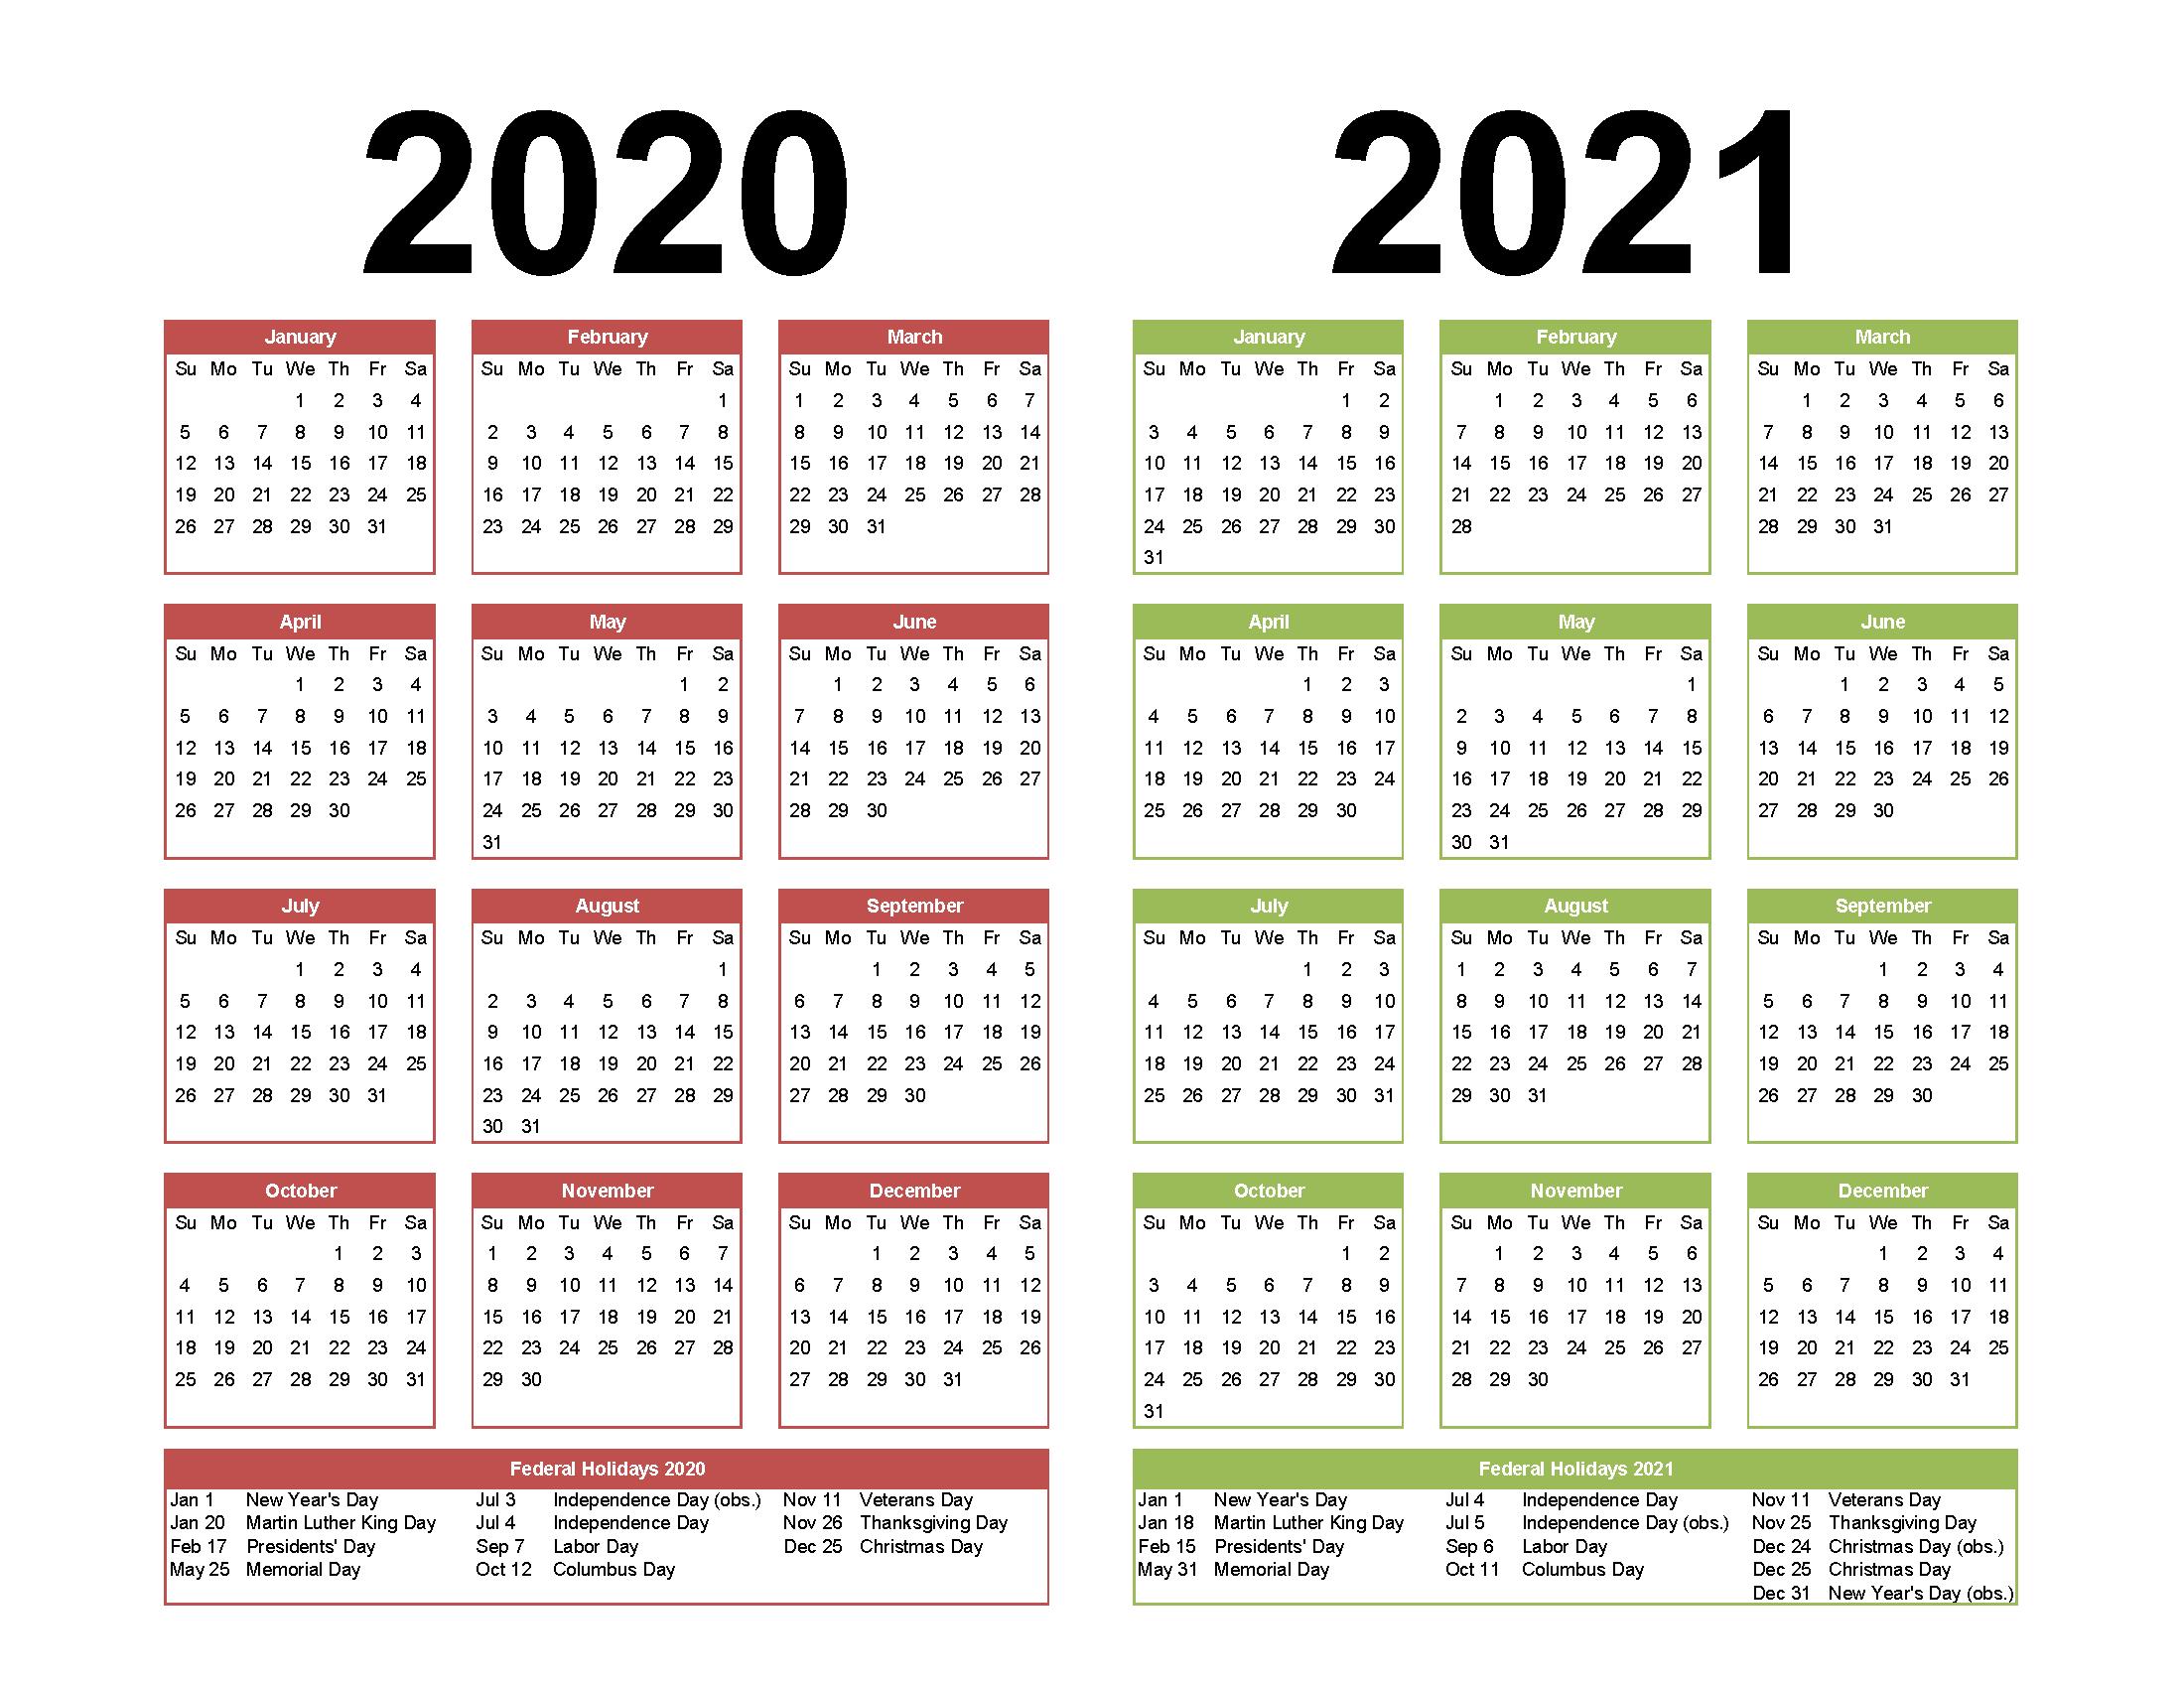 2 Year Calendar Printable 2020 2021 Word Pdf Image